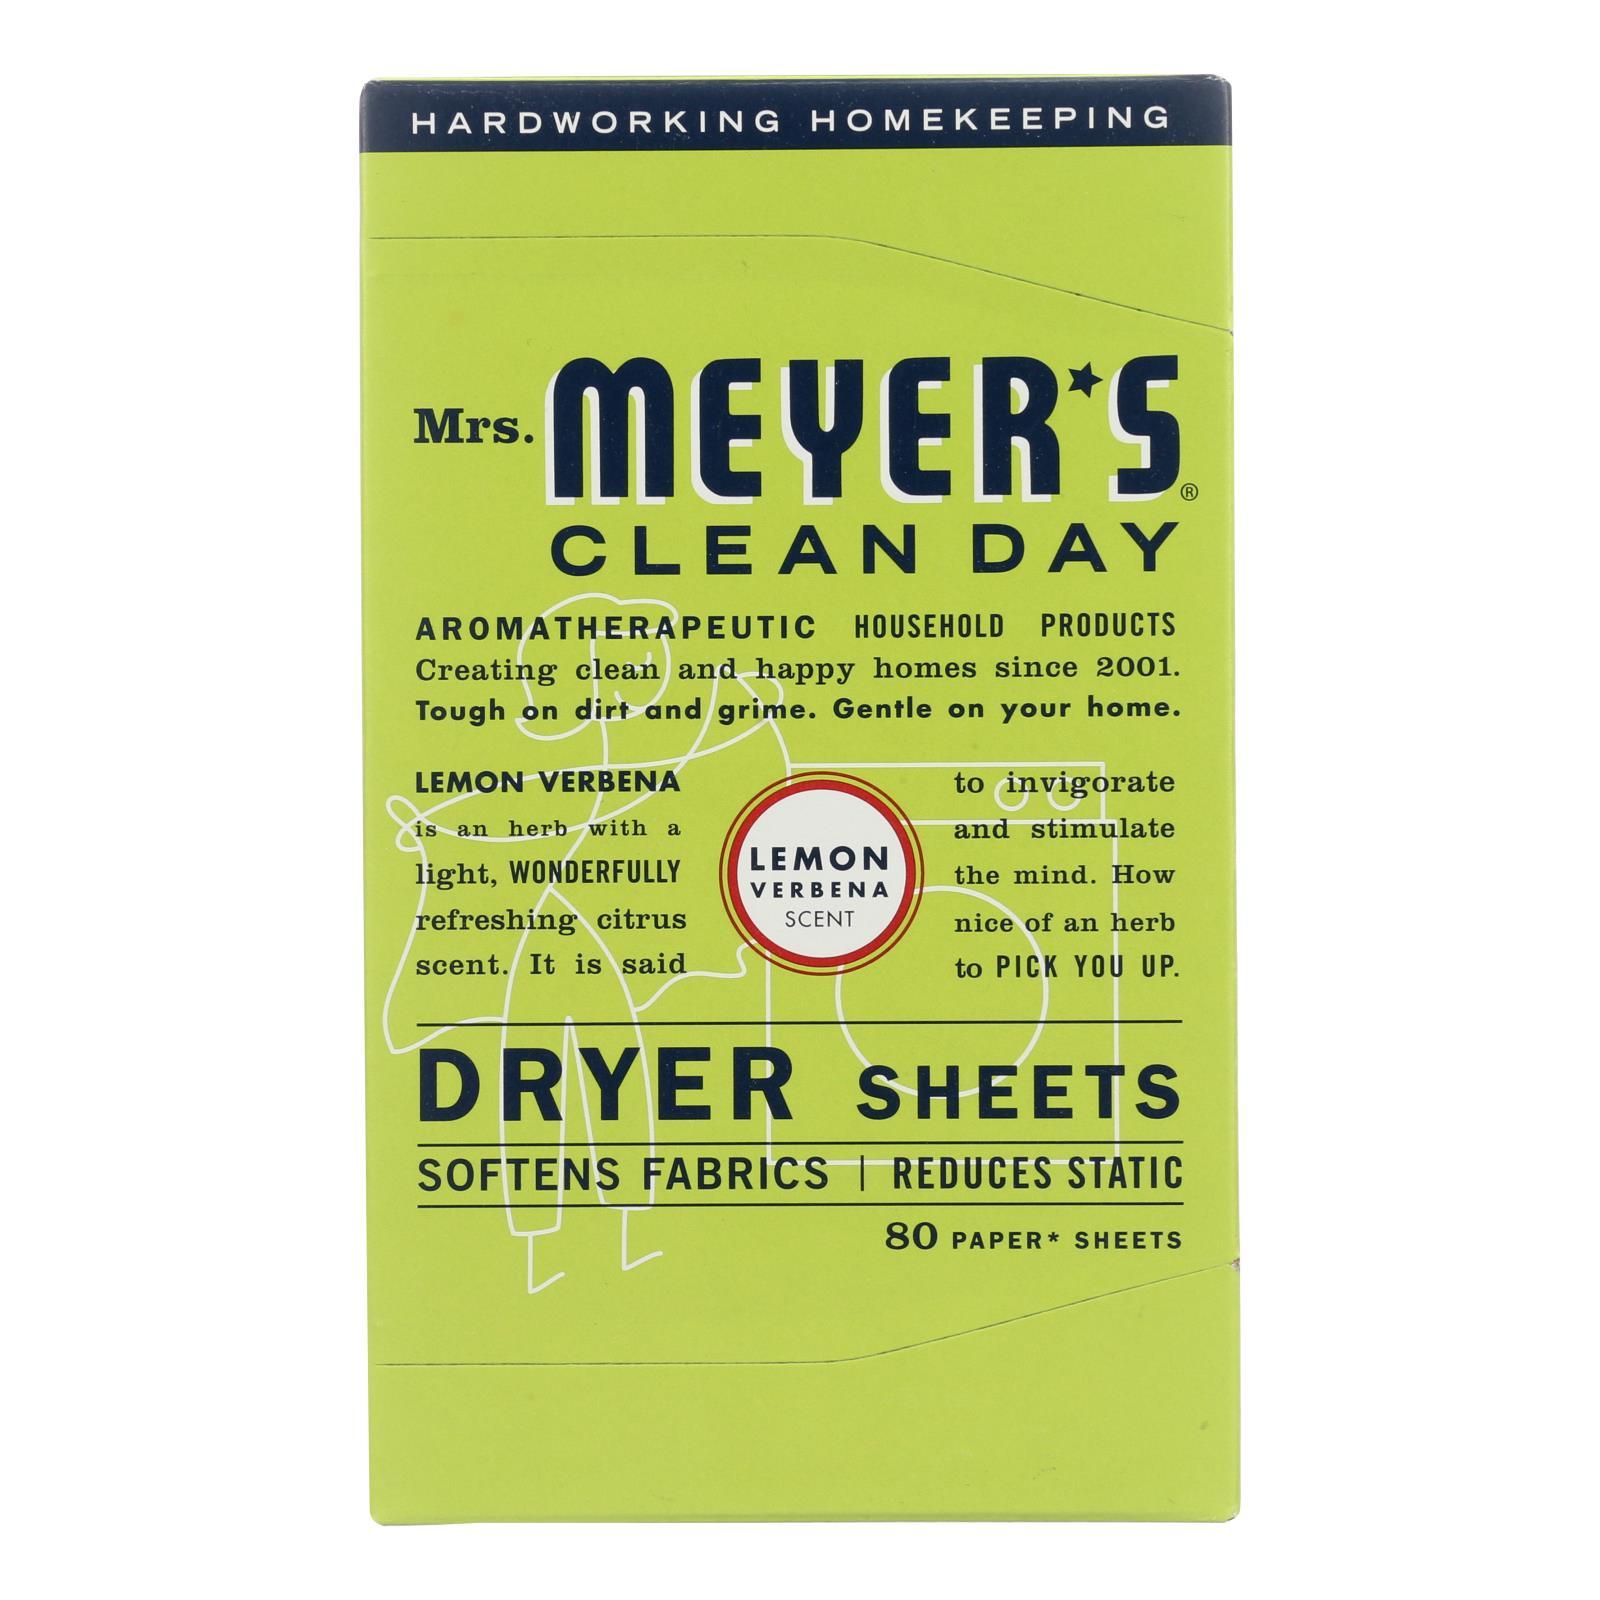 Mrs. Meyer's Clean Day - Dryer Sheets - Lemon Verbena - Case of 12 - 80 Sheets